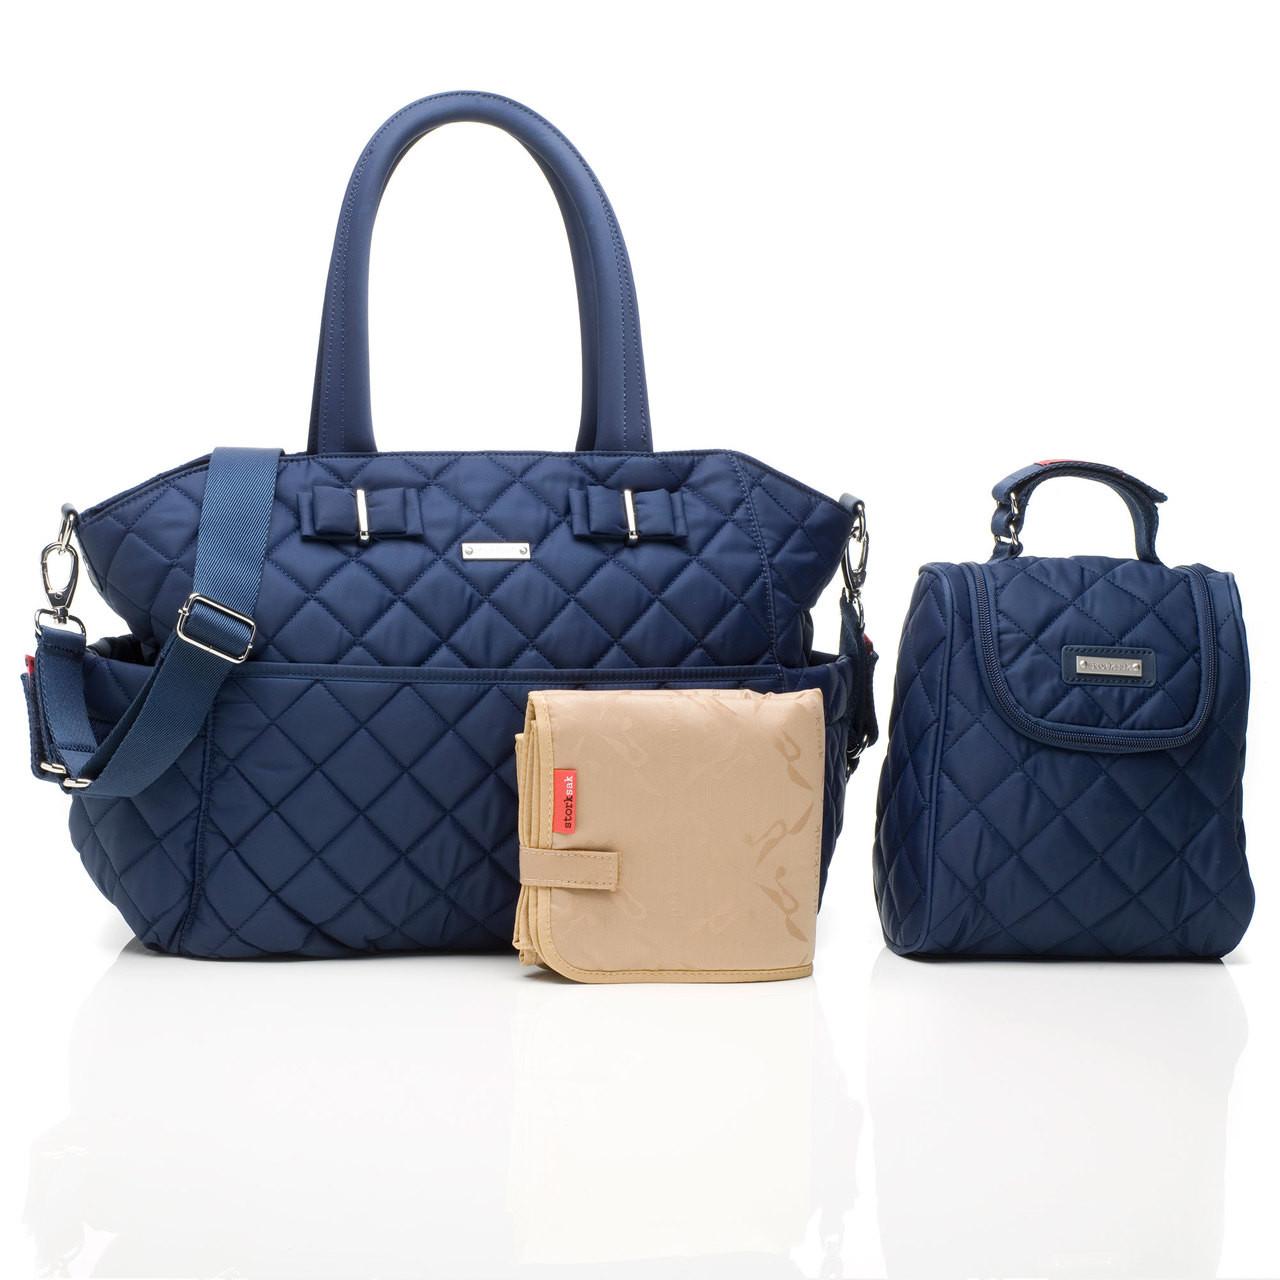 1ff5ba5c867ff Storksak Bobby Baby Nappy Bag Navy - Buy Baby Diaper Changing Bags ...